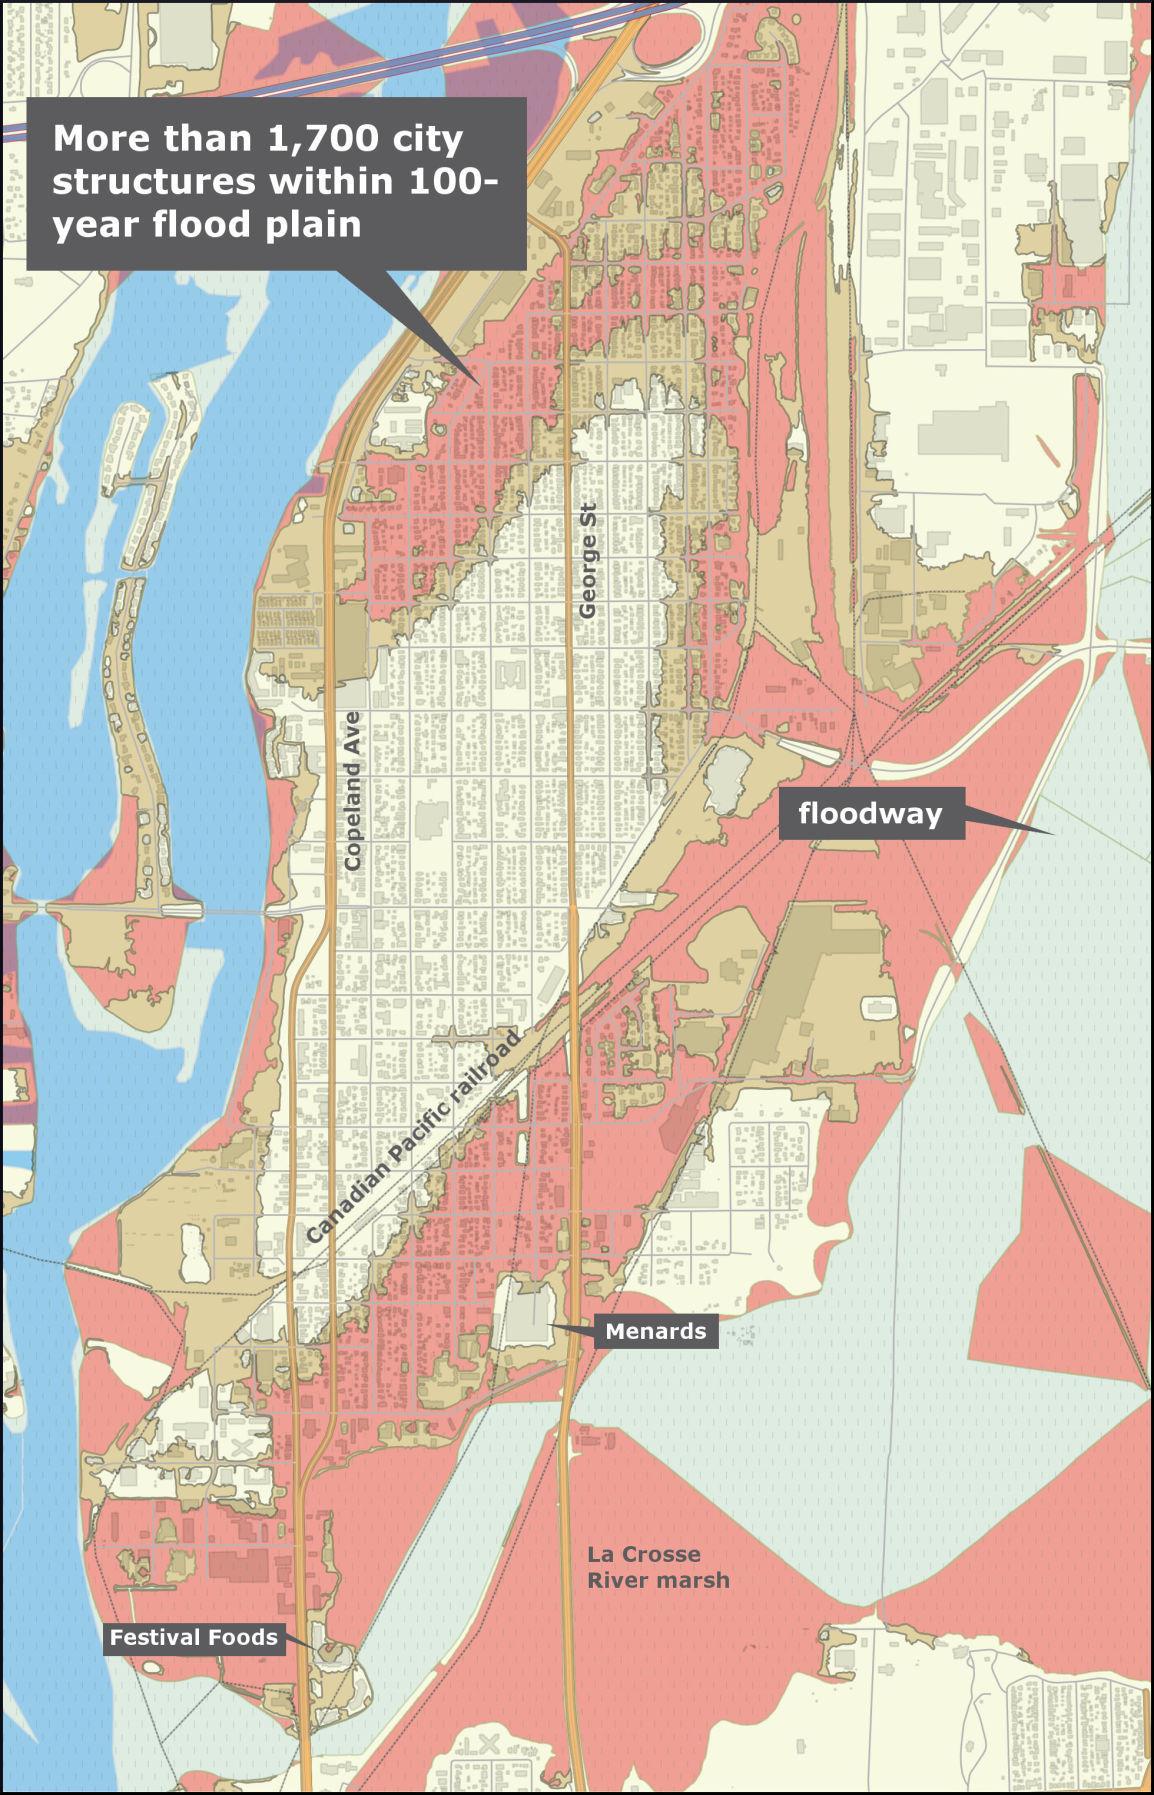 la crosse north side flood plain map